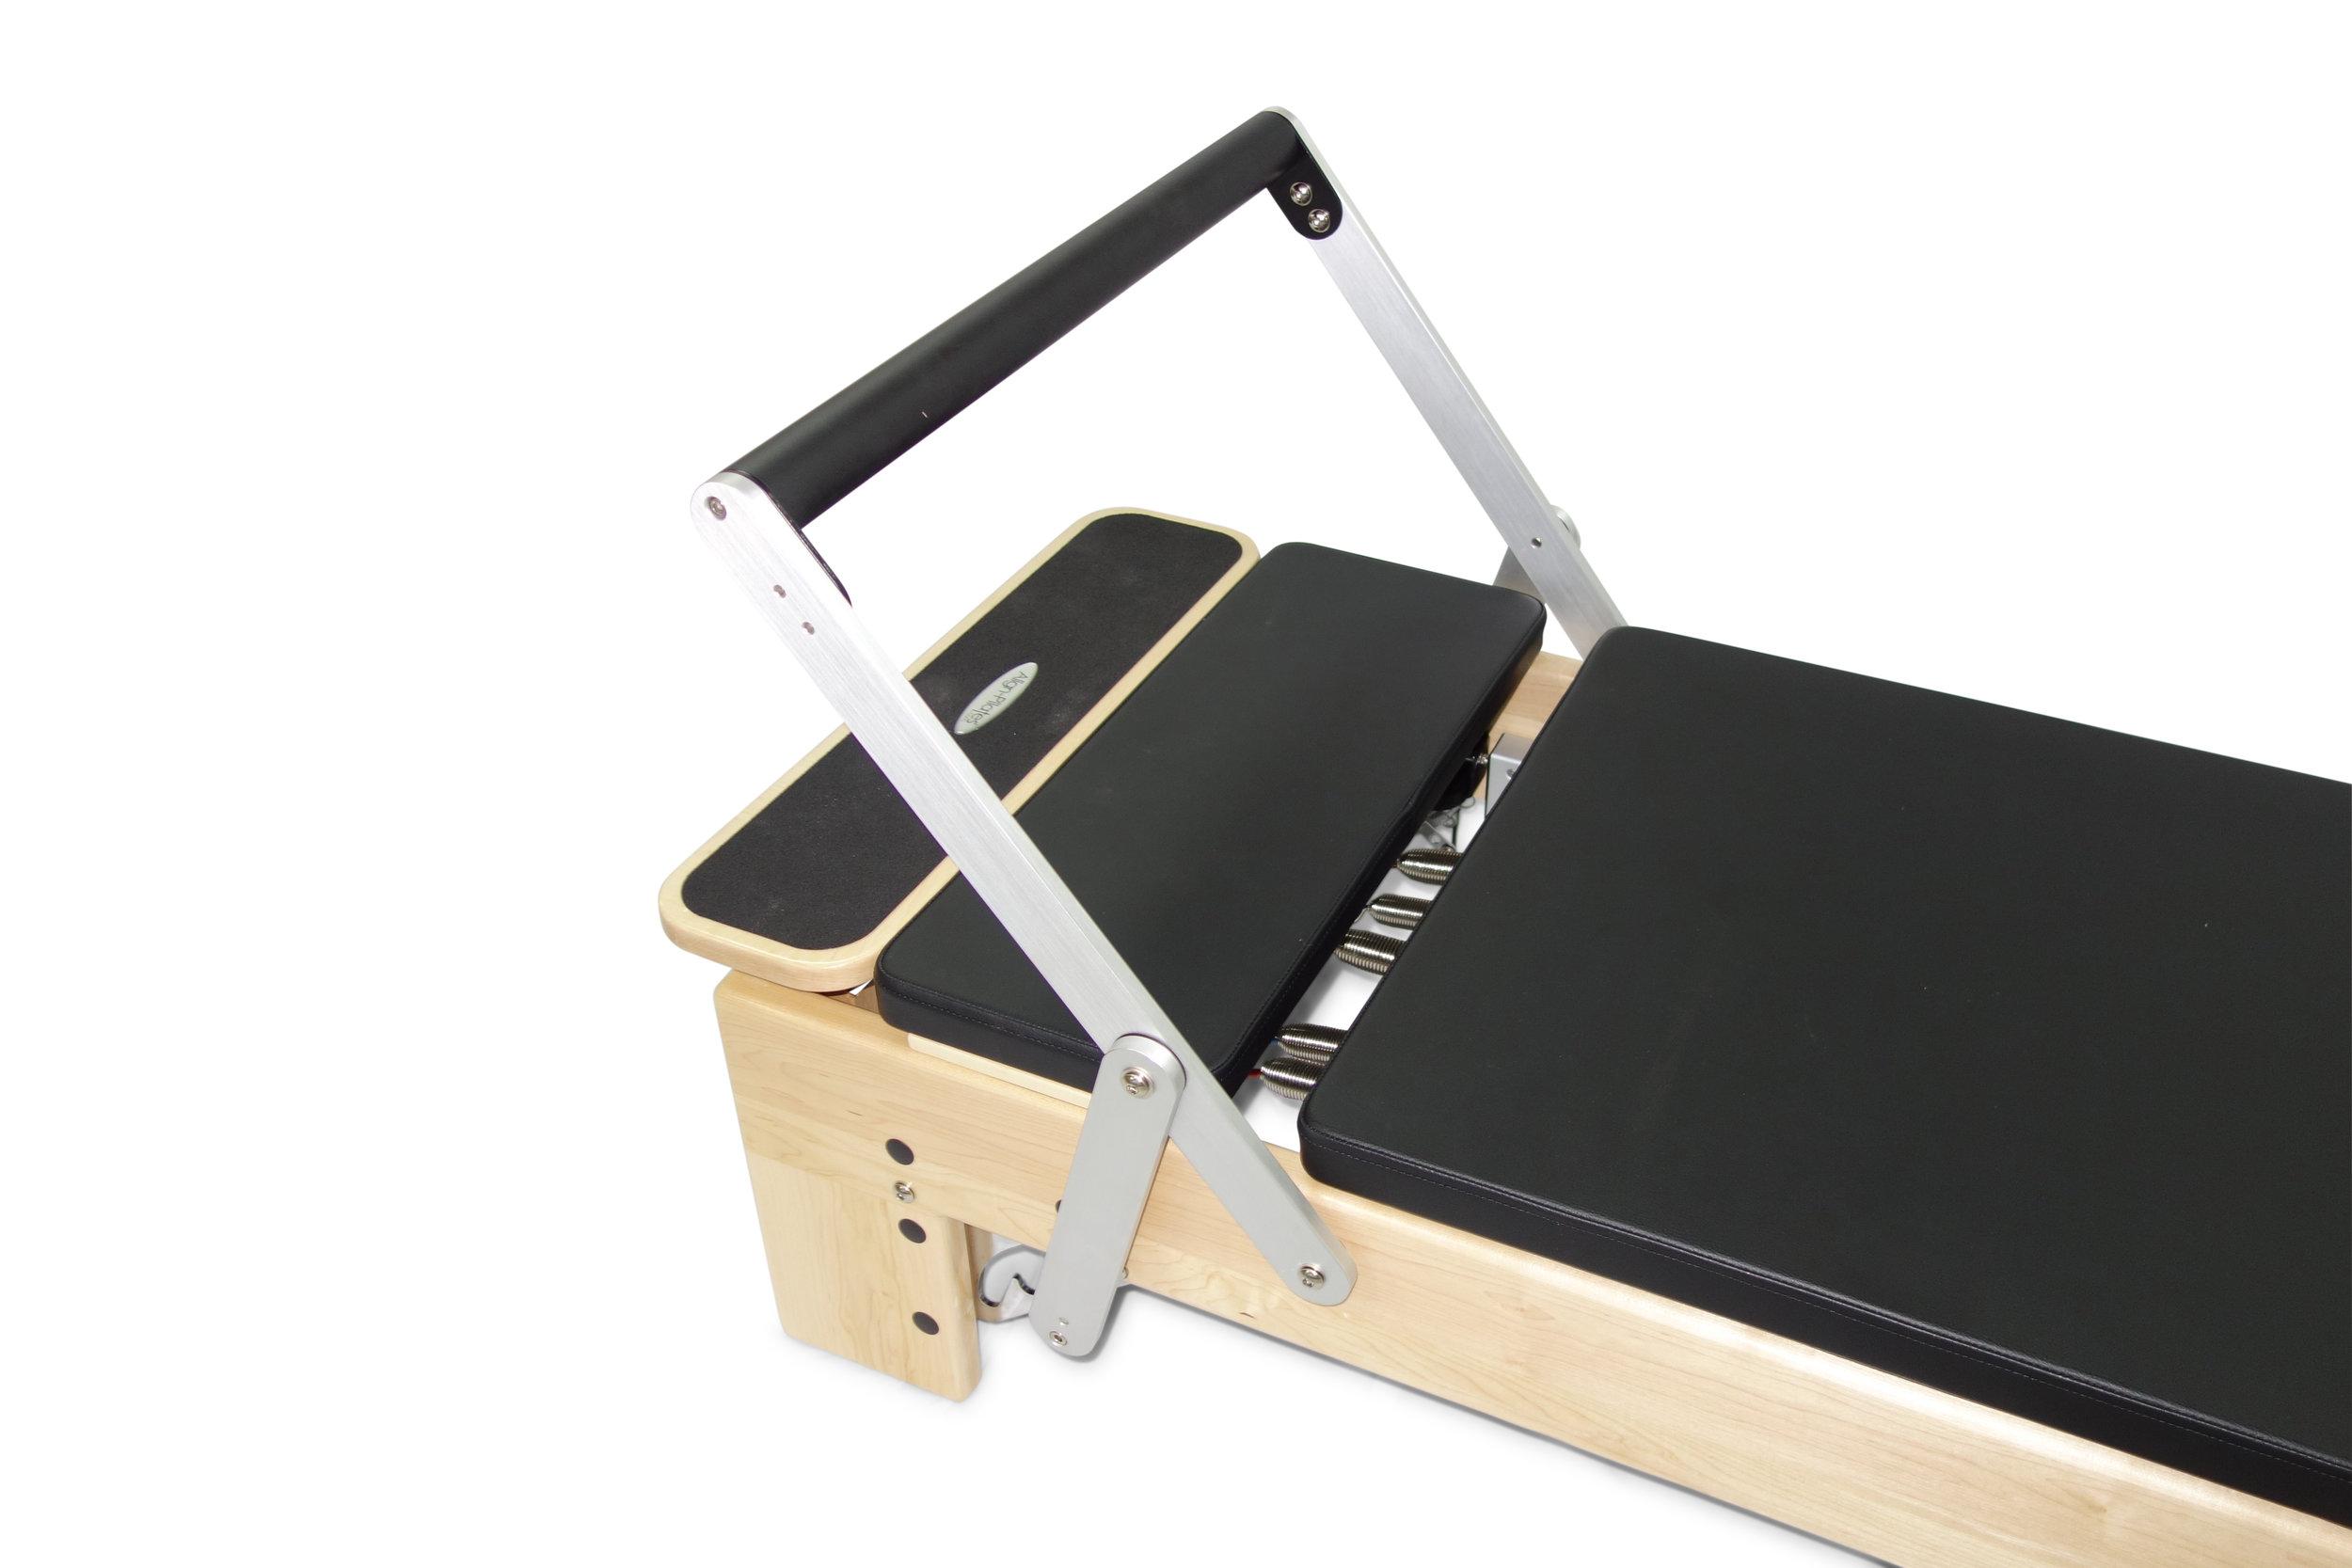 Align M2 Studio Maple Pilates Reformer with platform extension